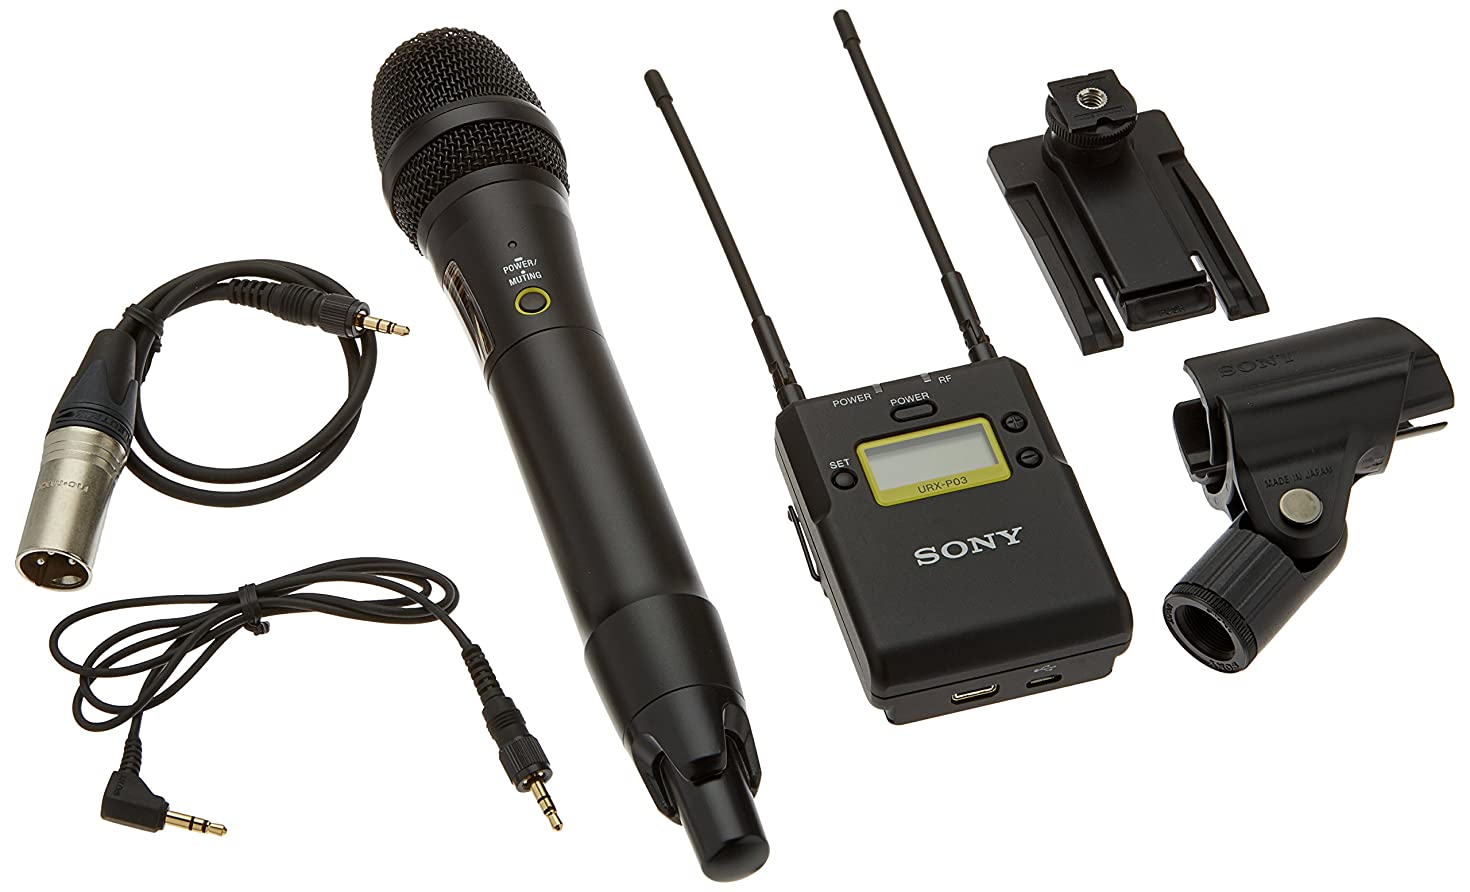 Sony Integrated Digital Wireless Handheld Microphone ENG System-UWPD12/14, Black (UWPD12/14)